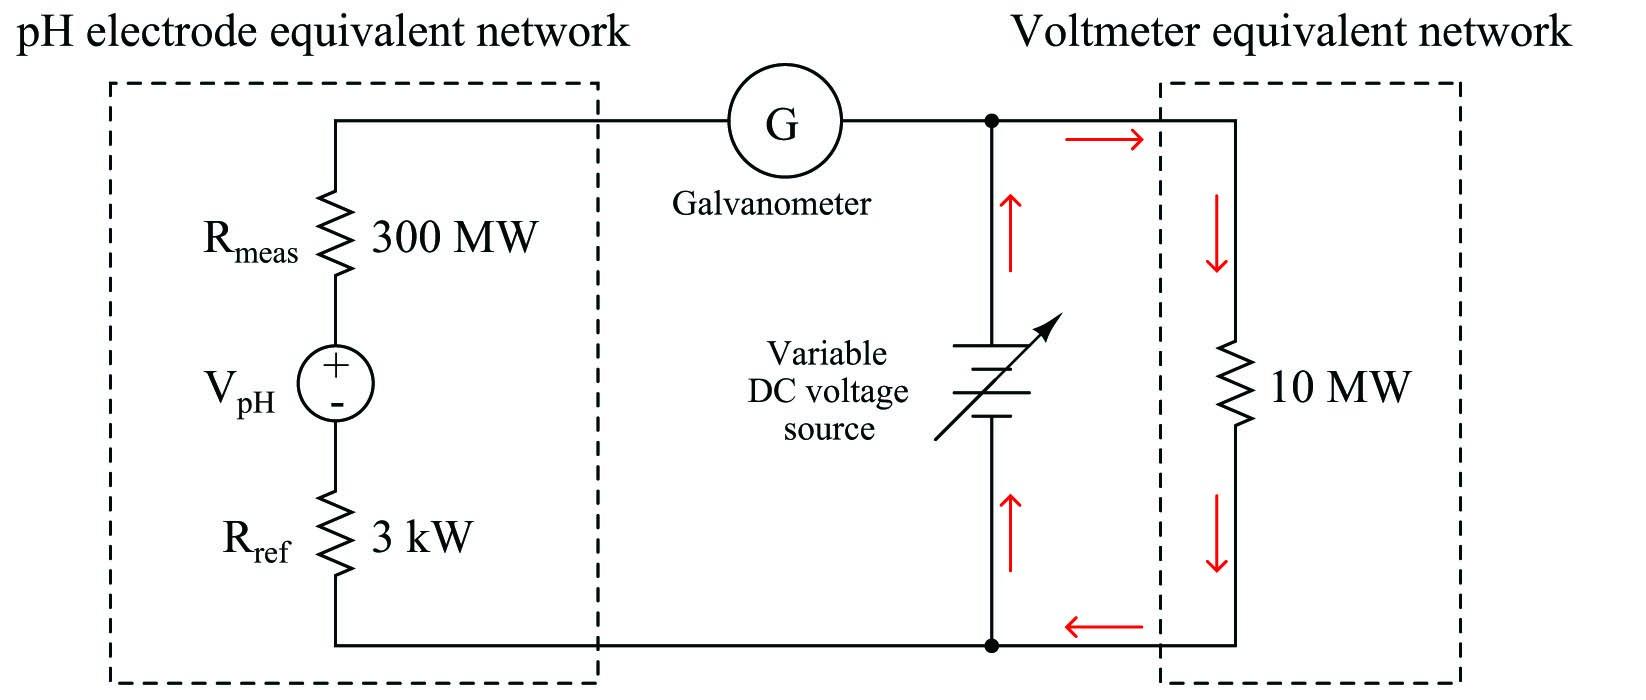 Http Msturriff Pbworks Com F Ammeter 20and 20voltmeter 20placement 20worksheet Pdf [ rgb(241,244,241) x 7YsxgGzCzkF_iM Pixel ]